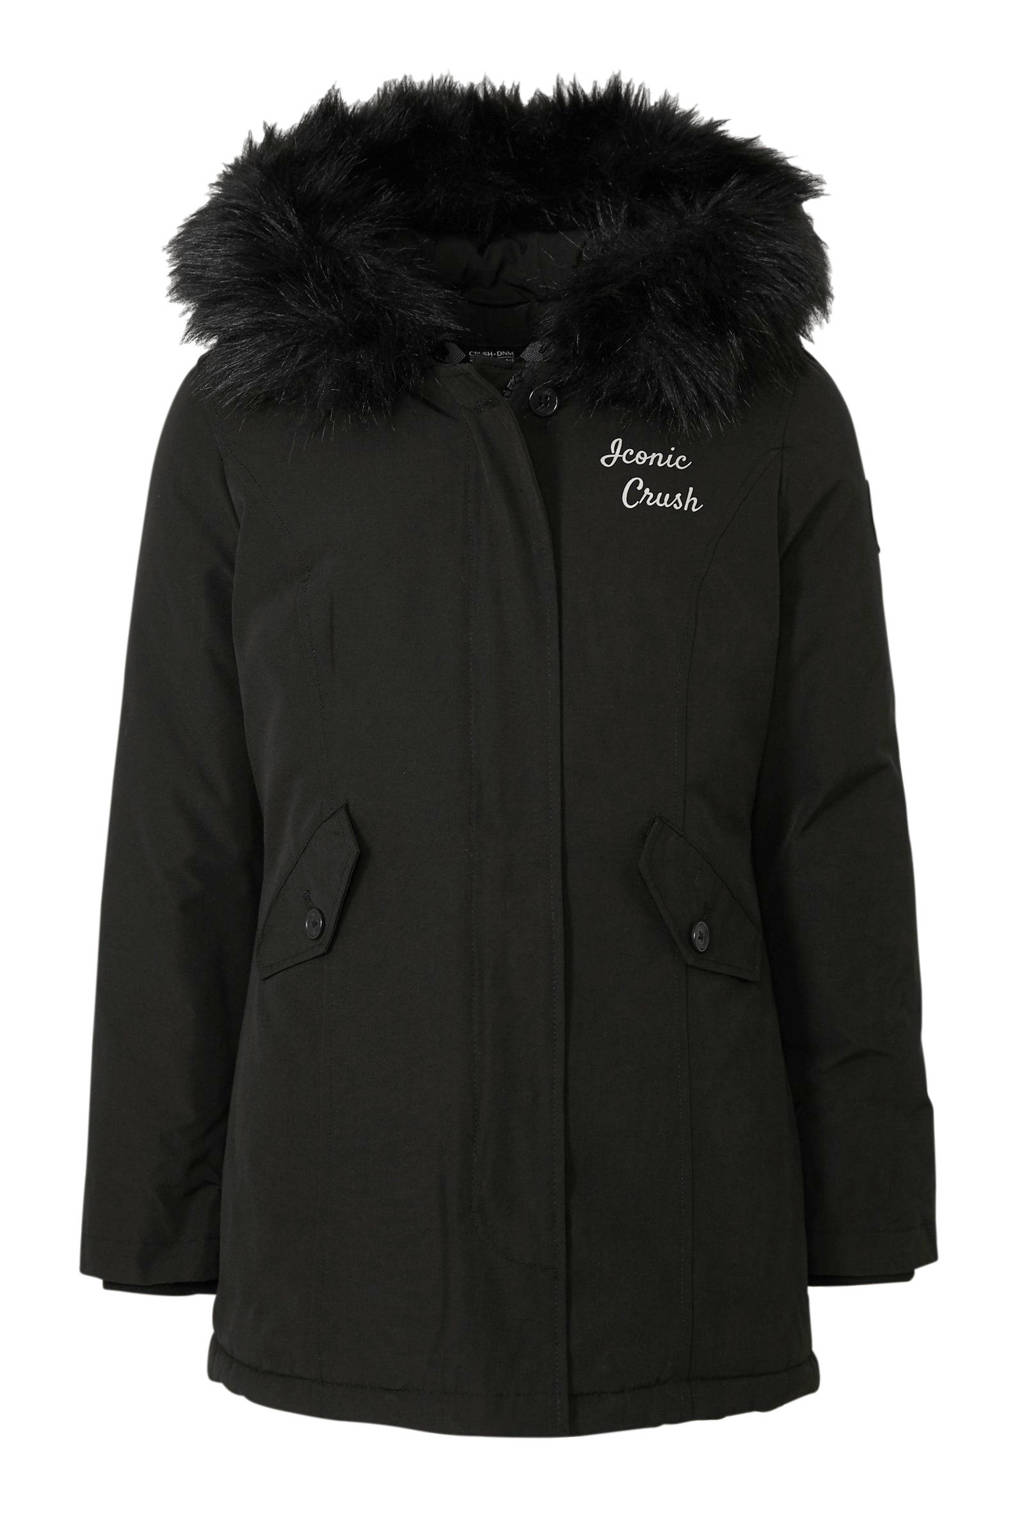 Crush Denim parka winterjas Joyce met tekst en patches zwart, Zwart